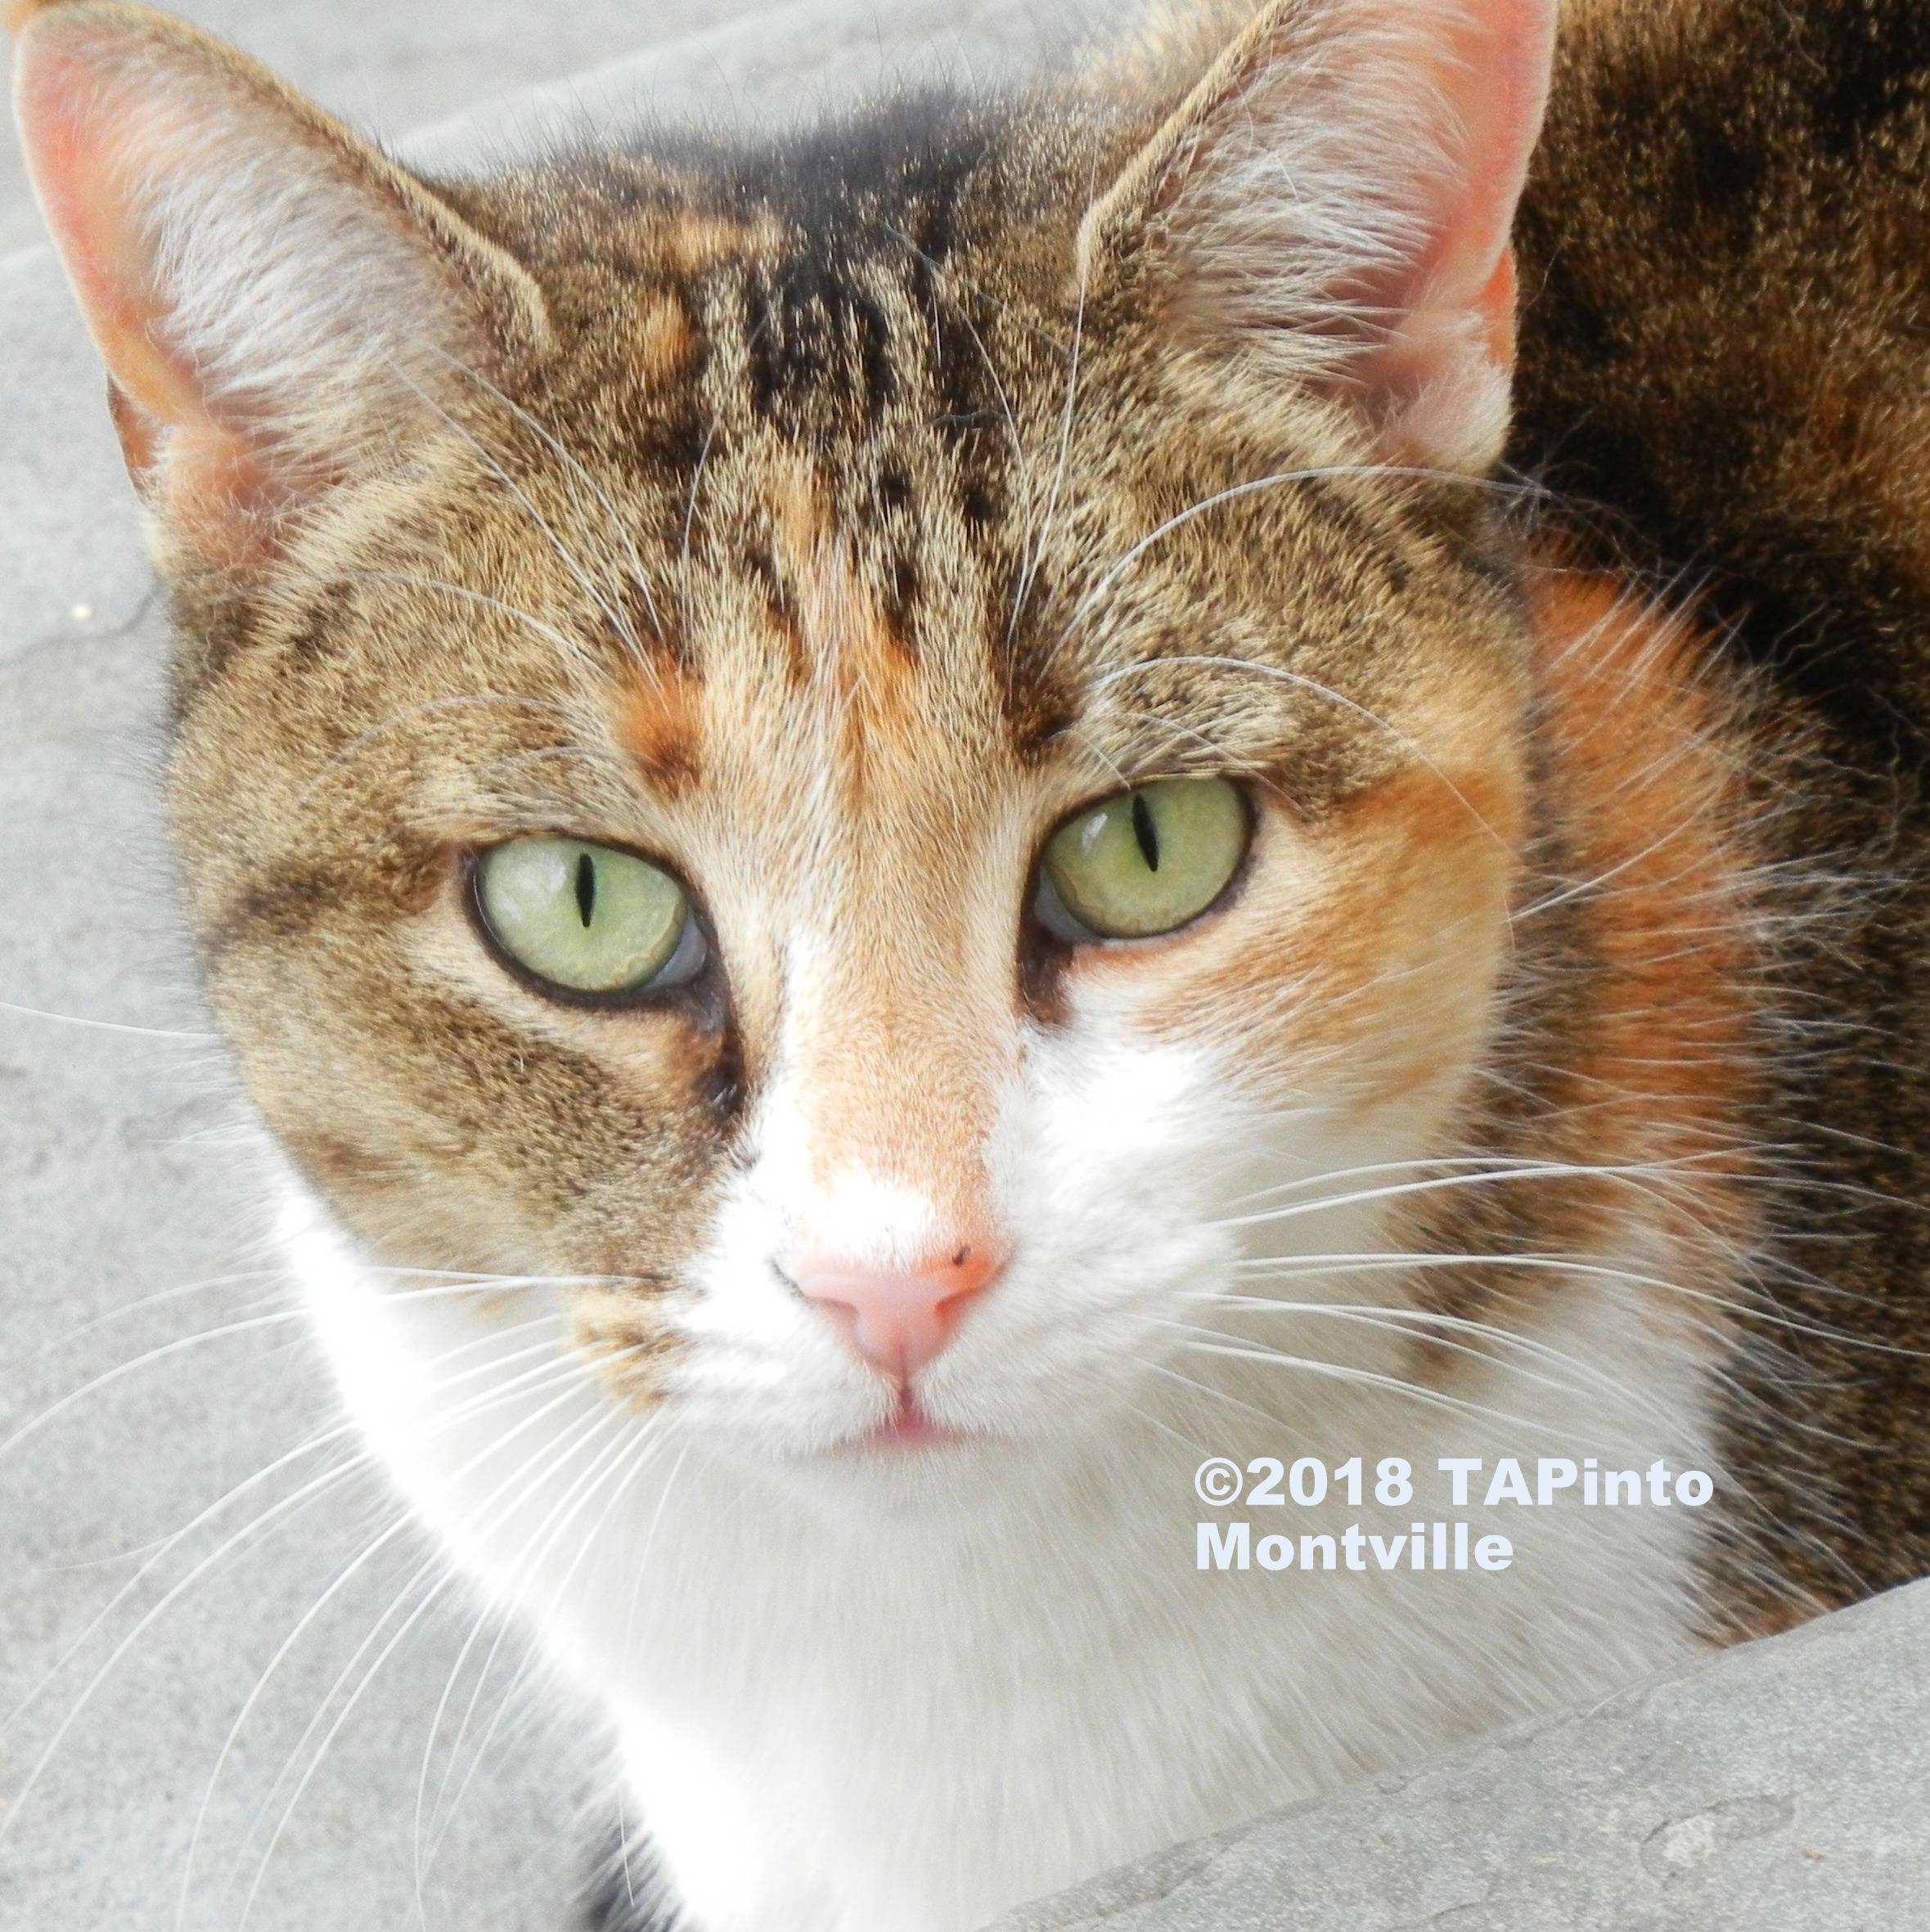 cat watermark ©2018 TAPinto Montville.JPG